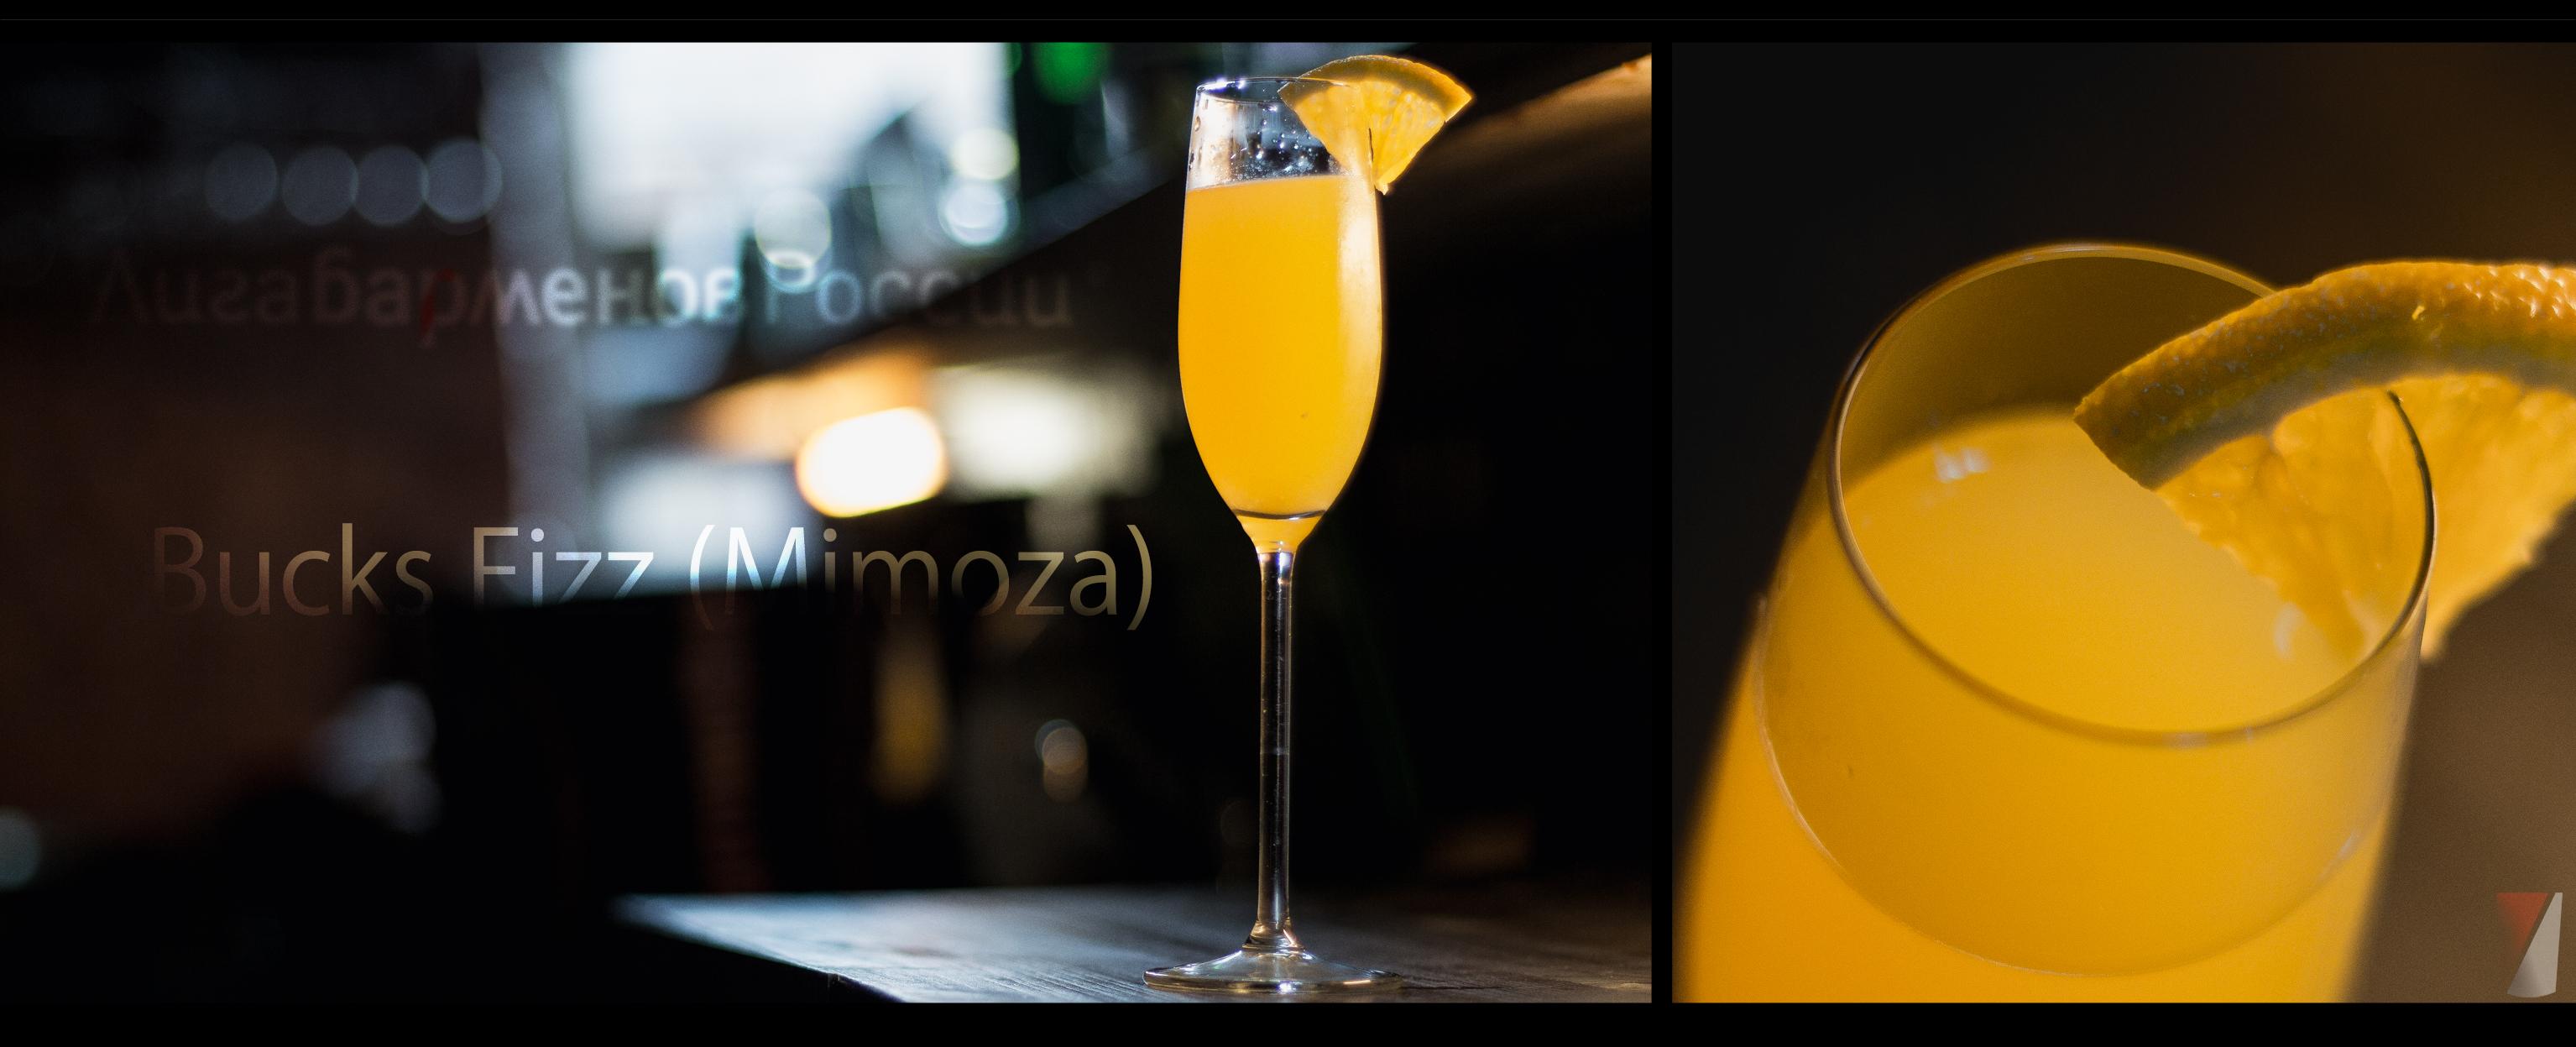 Рецепт коктейля Bucks-Fizz-(Mimoza)